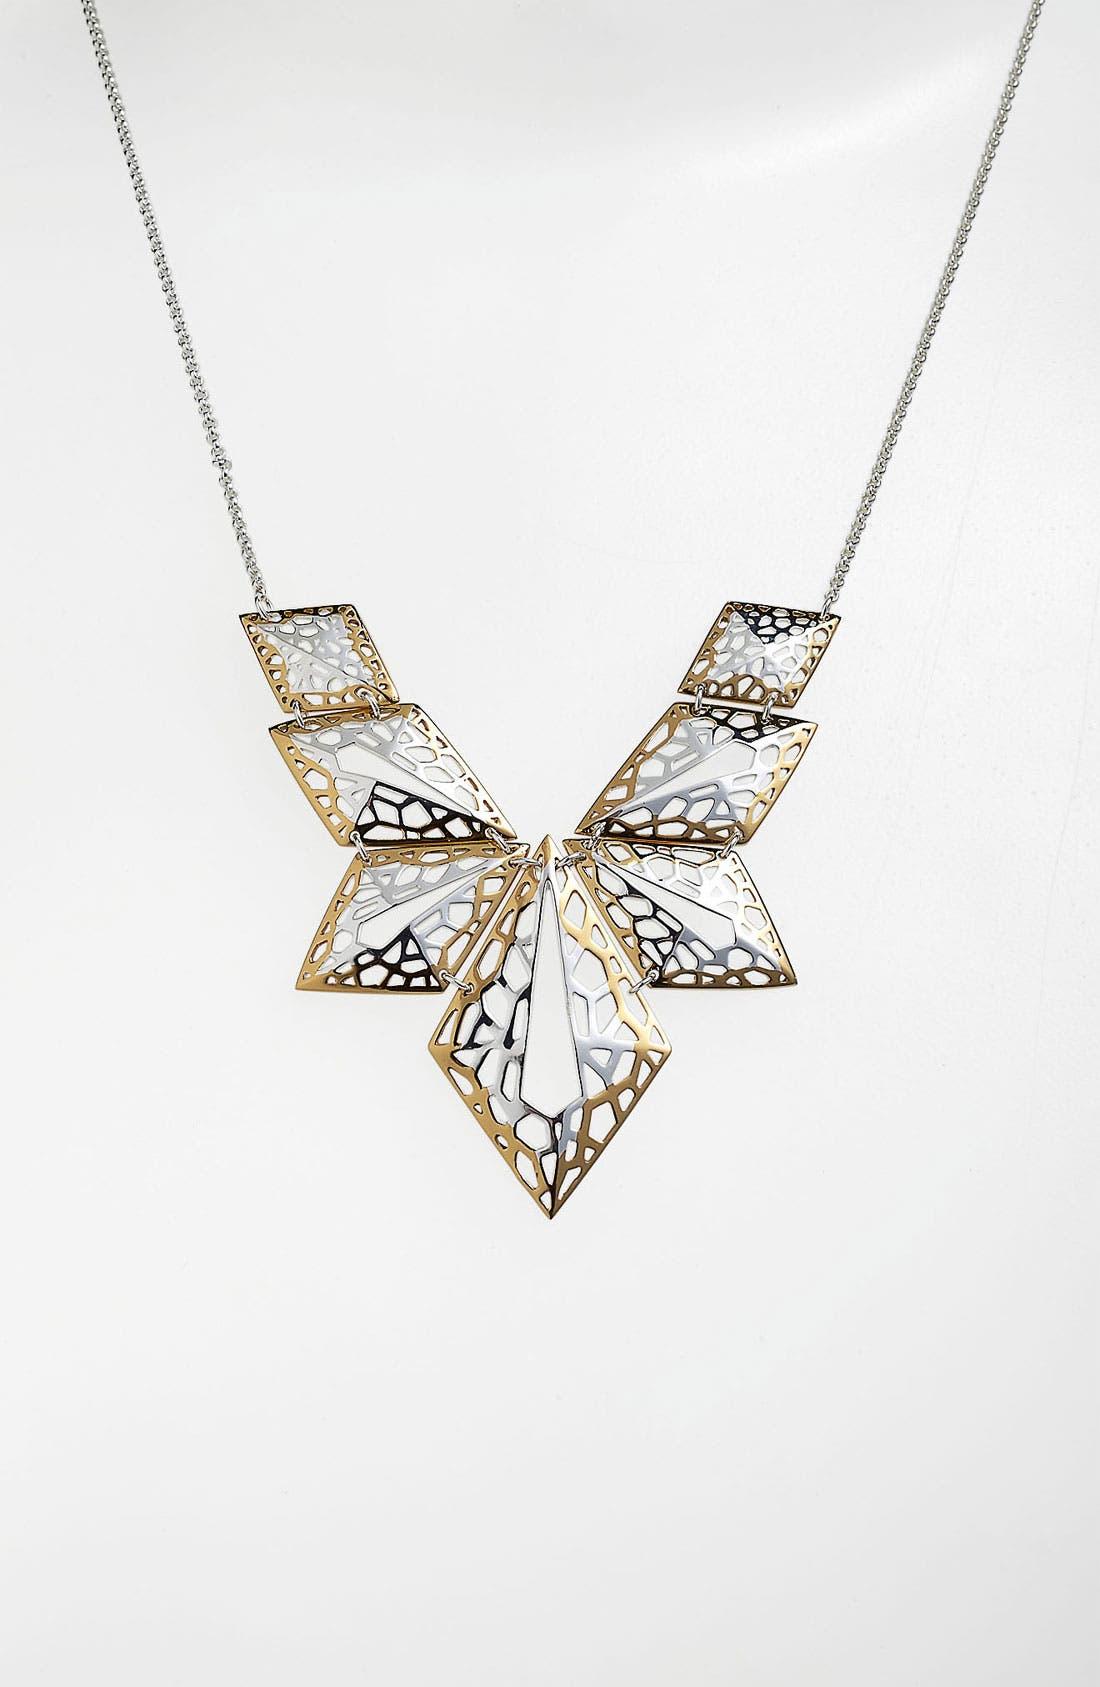 Alternate Image 1 Selected - Argento Vivo 'Prism' Geometric Statement Necklace